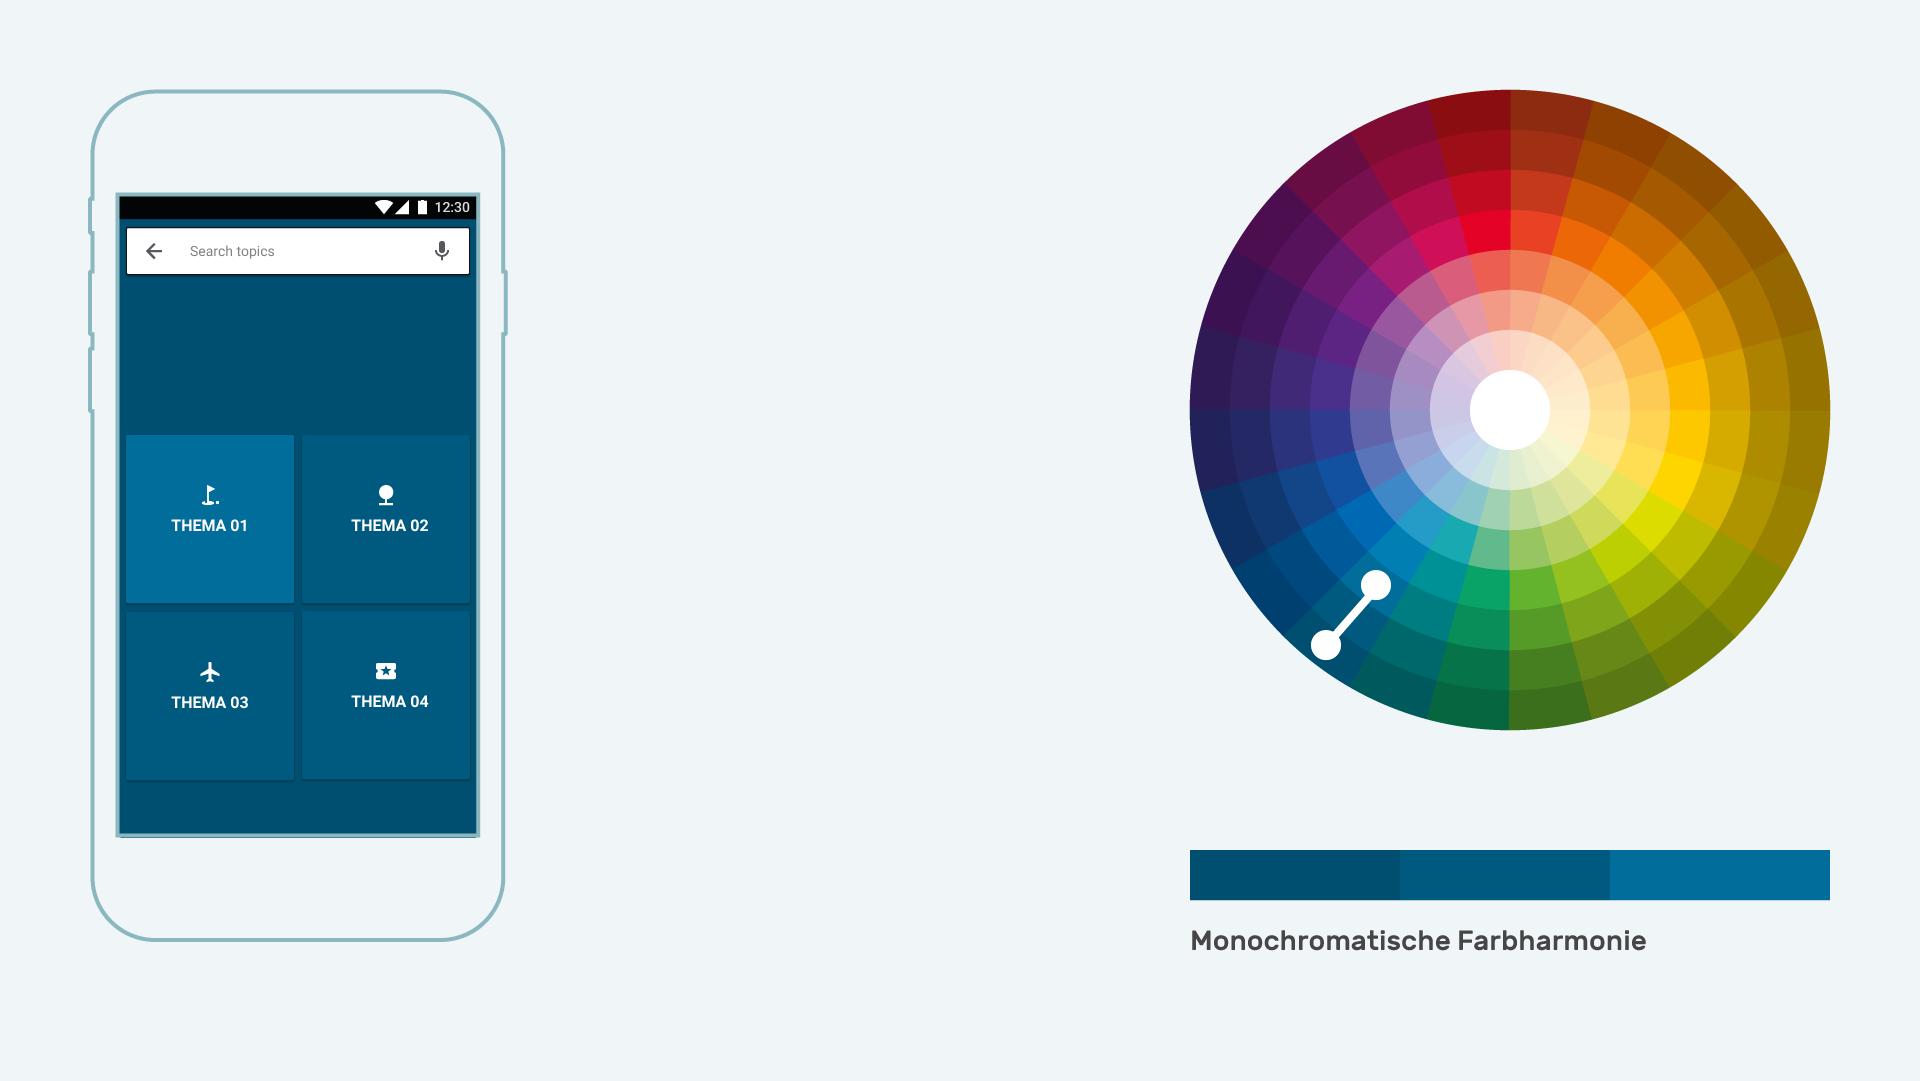 Infografik Userinterfacedesign Farbharmonien monochromatische Farbharmonie positiv